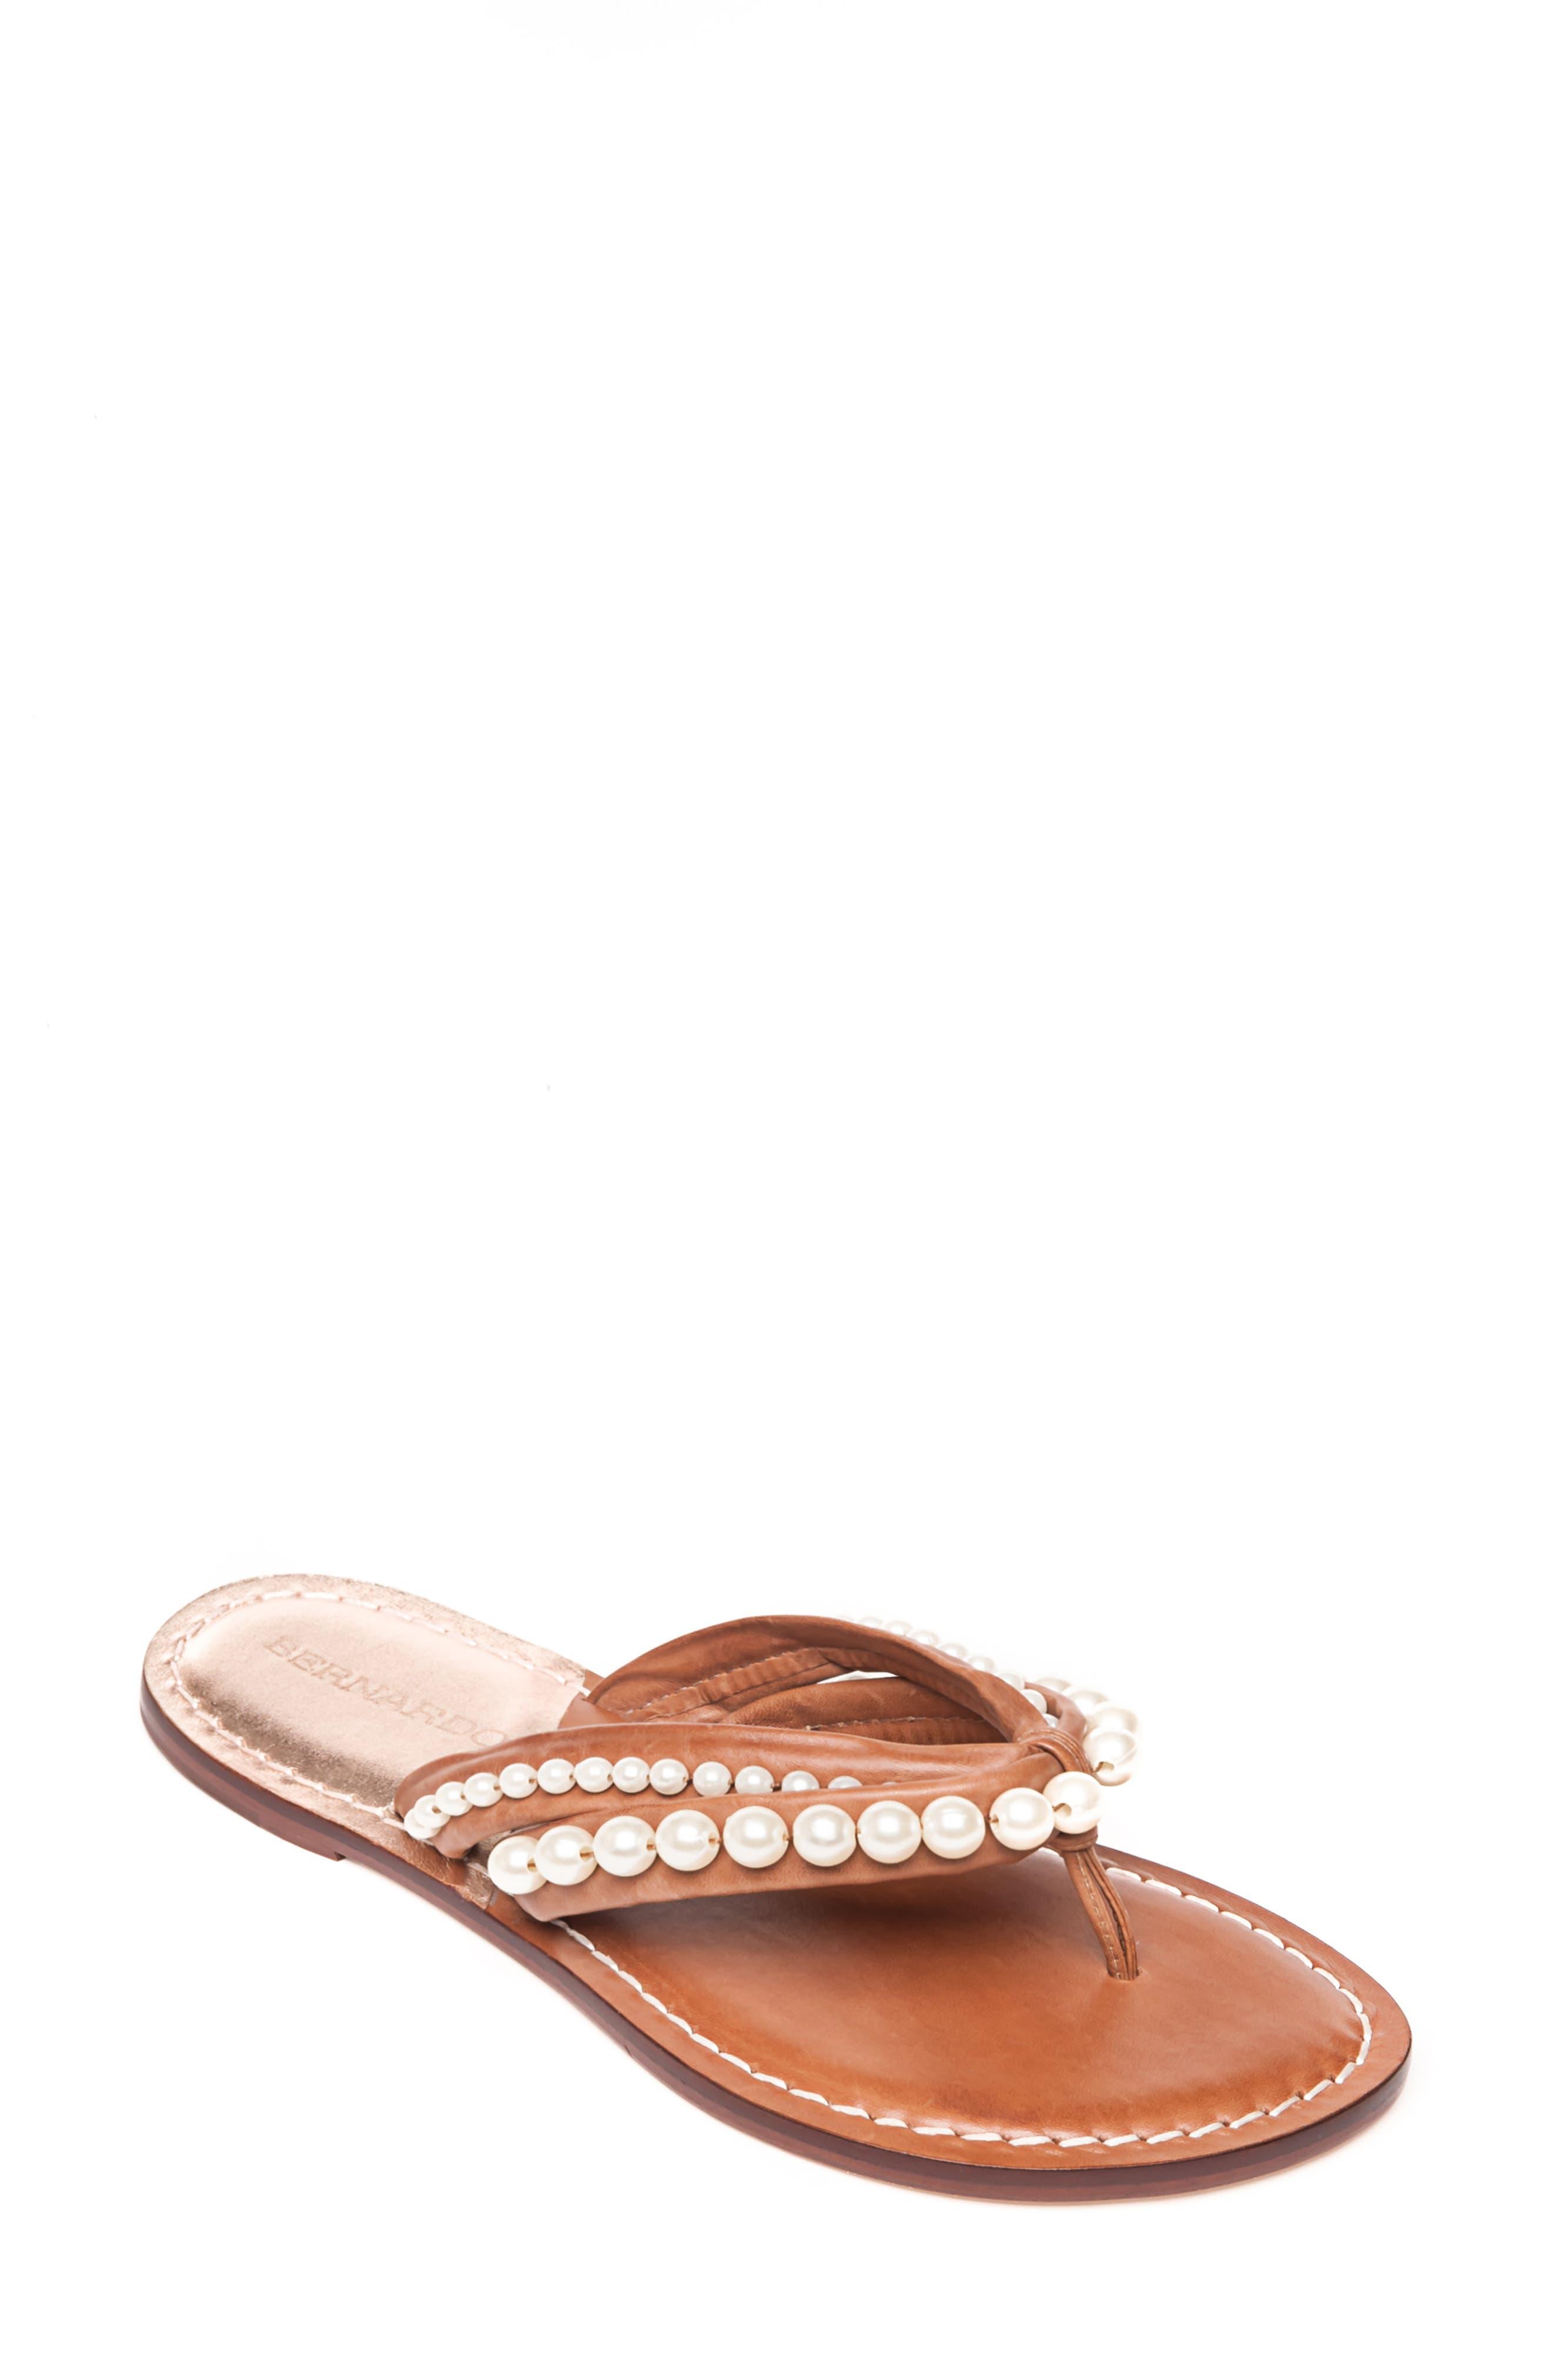 Miami Imitation Pearl Flip Flop